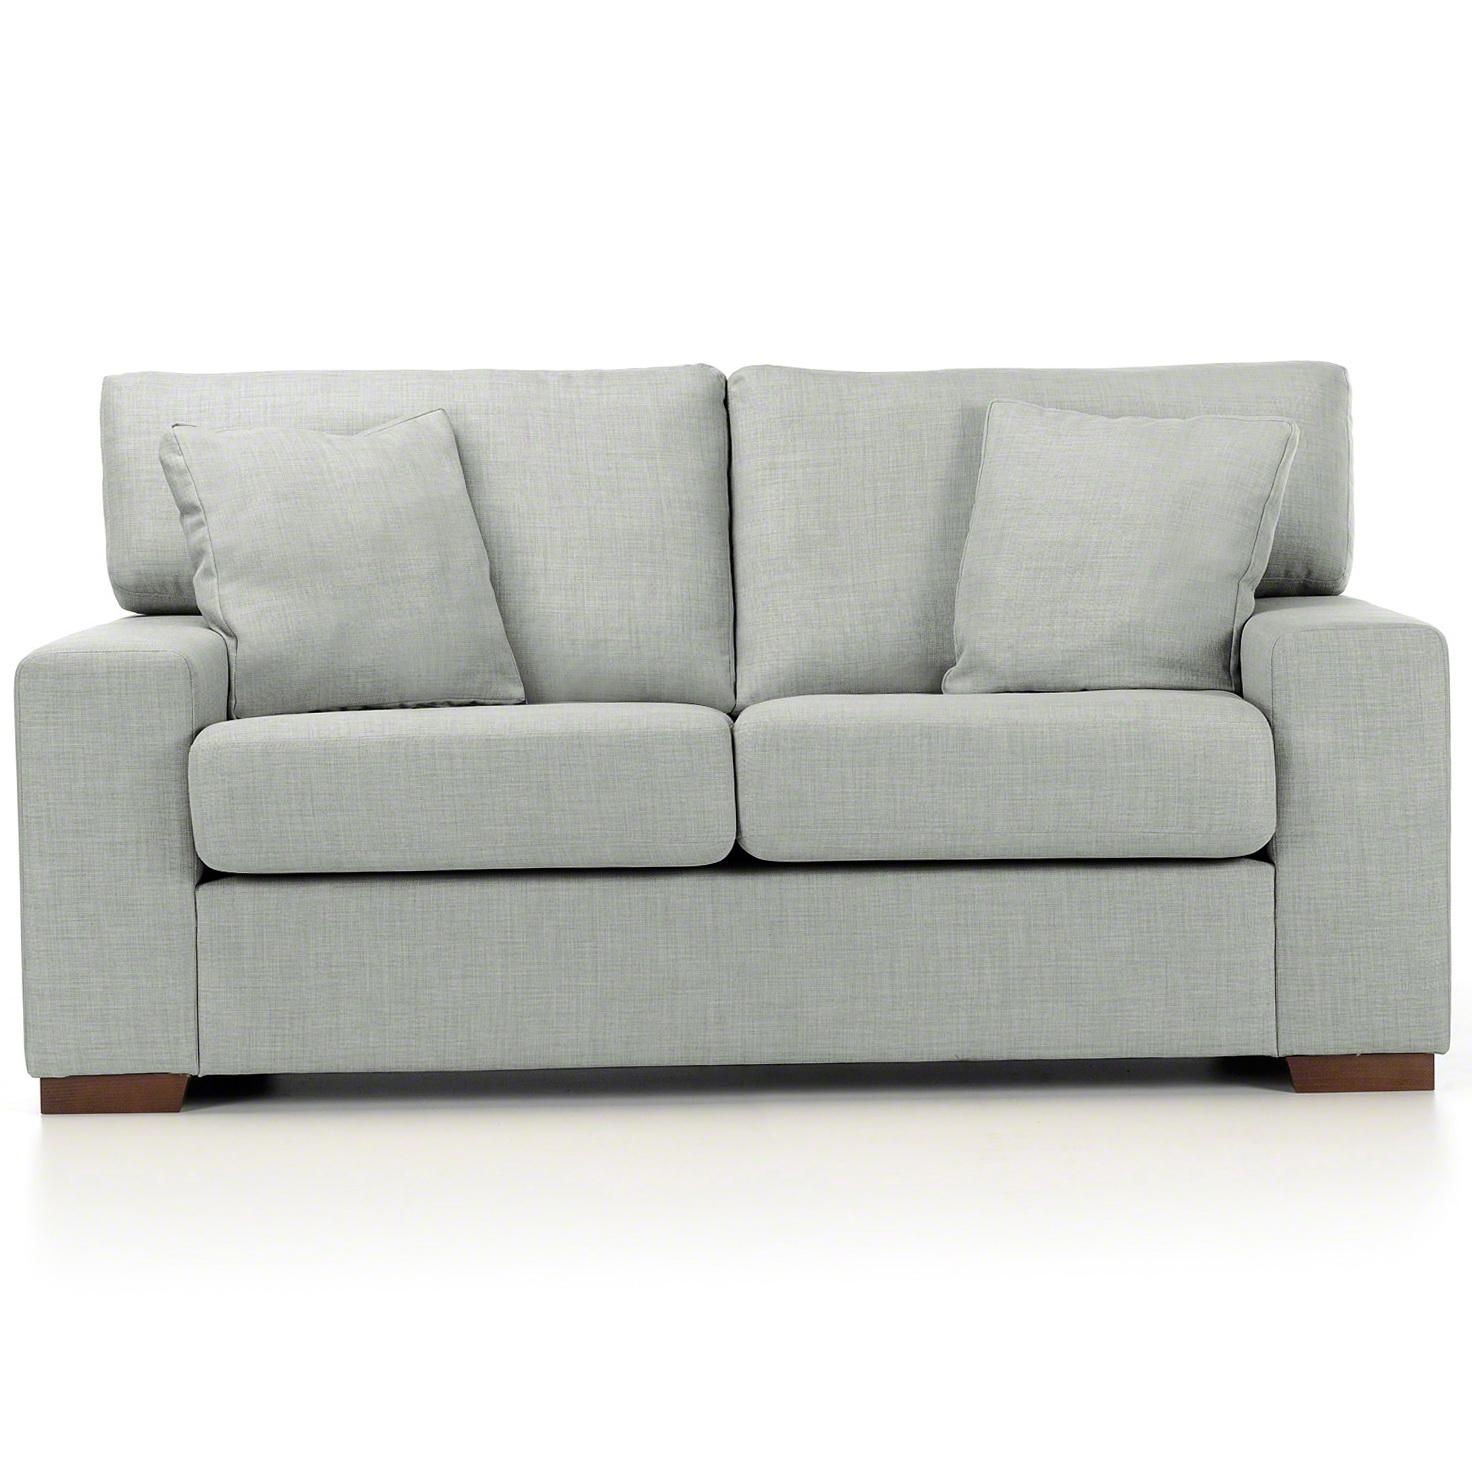 sofa covers in chennai grey uk foam cushions home design ideas